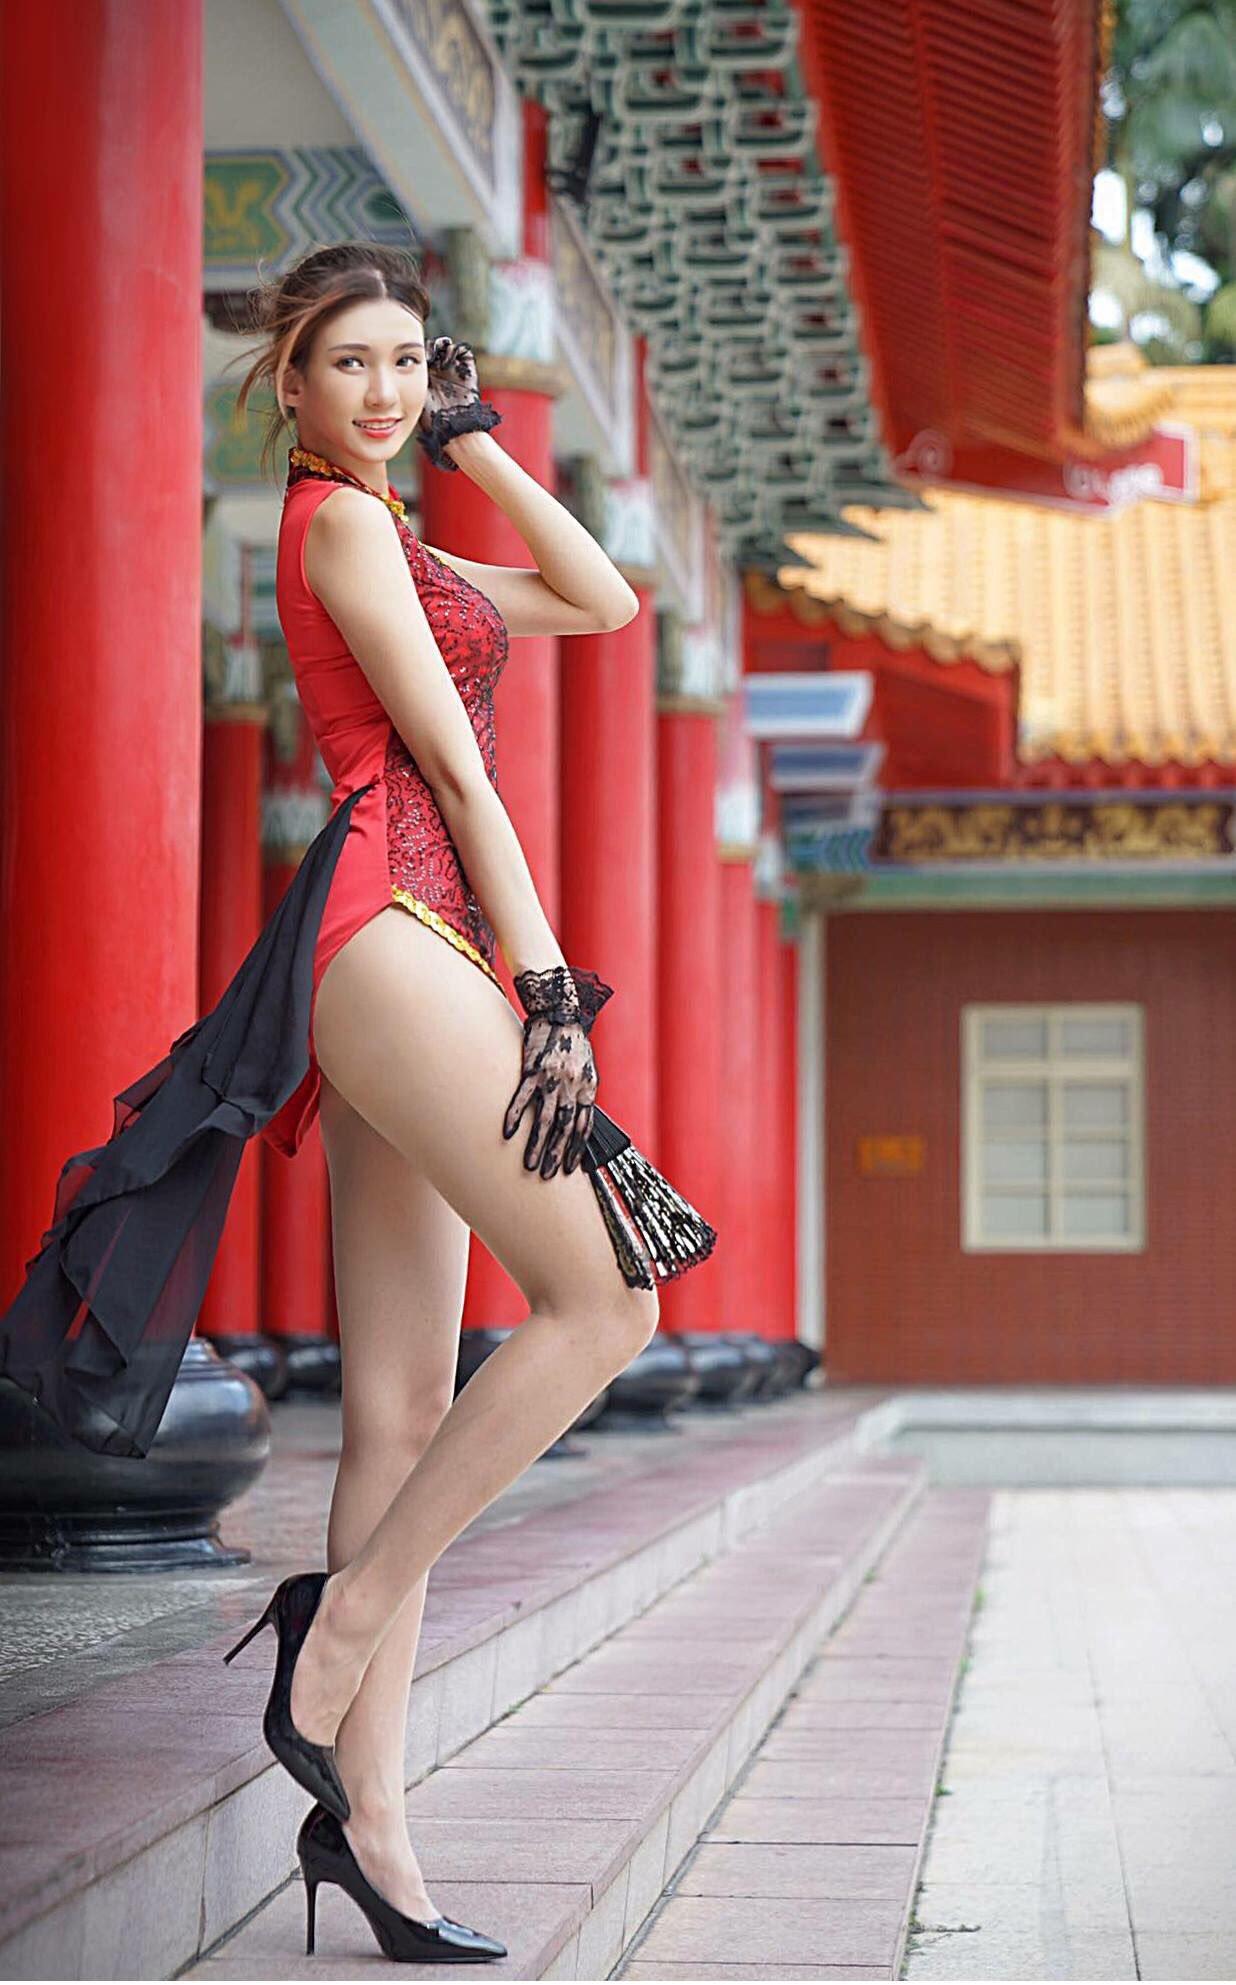 Candice蔡译心の美脚 19